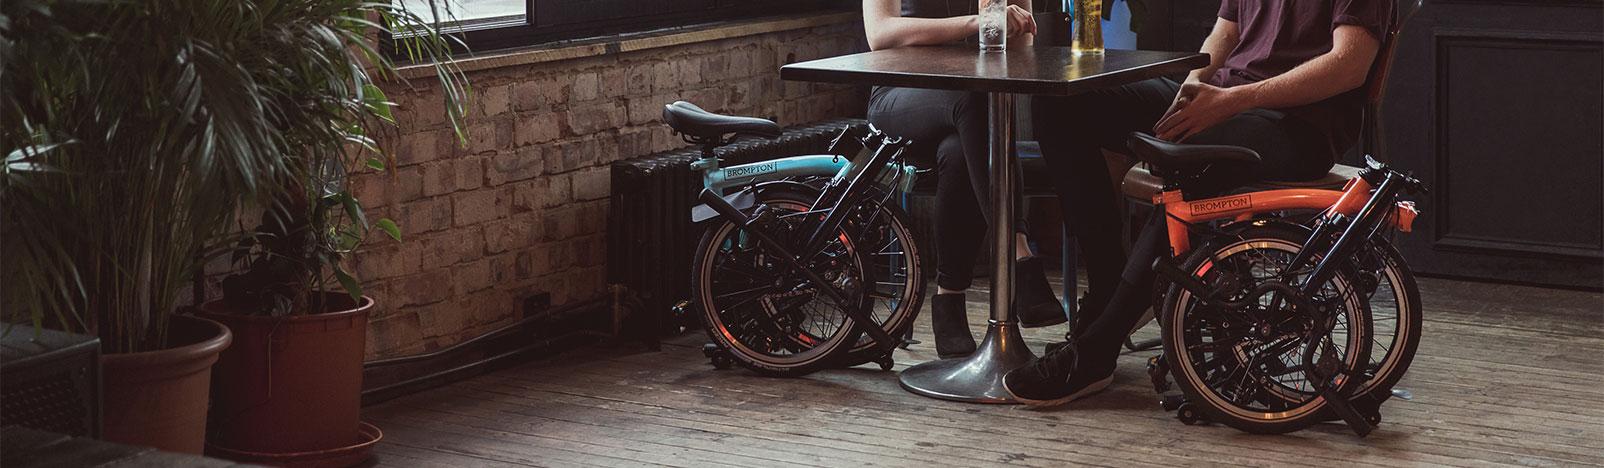 Brompton Black Edition folding bike